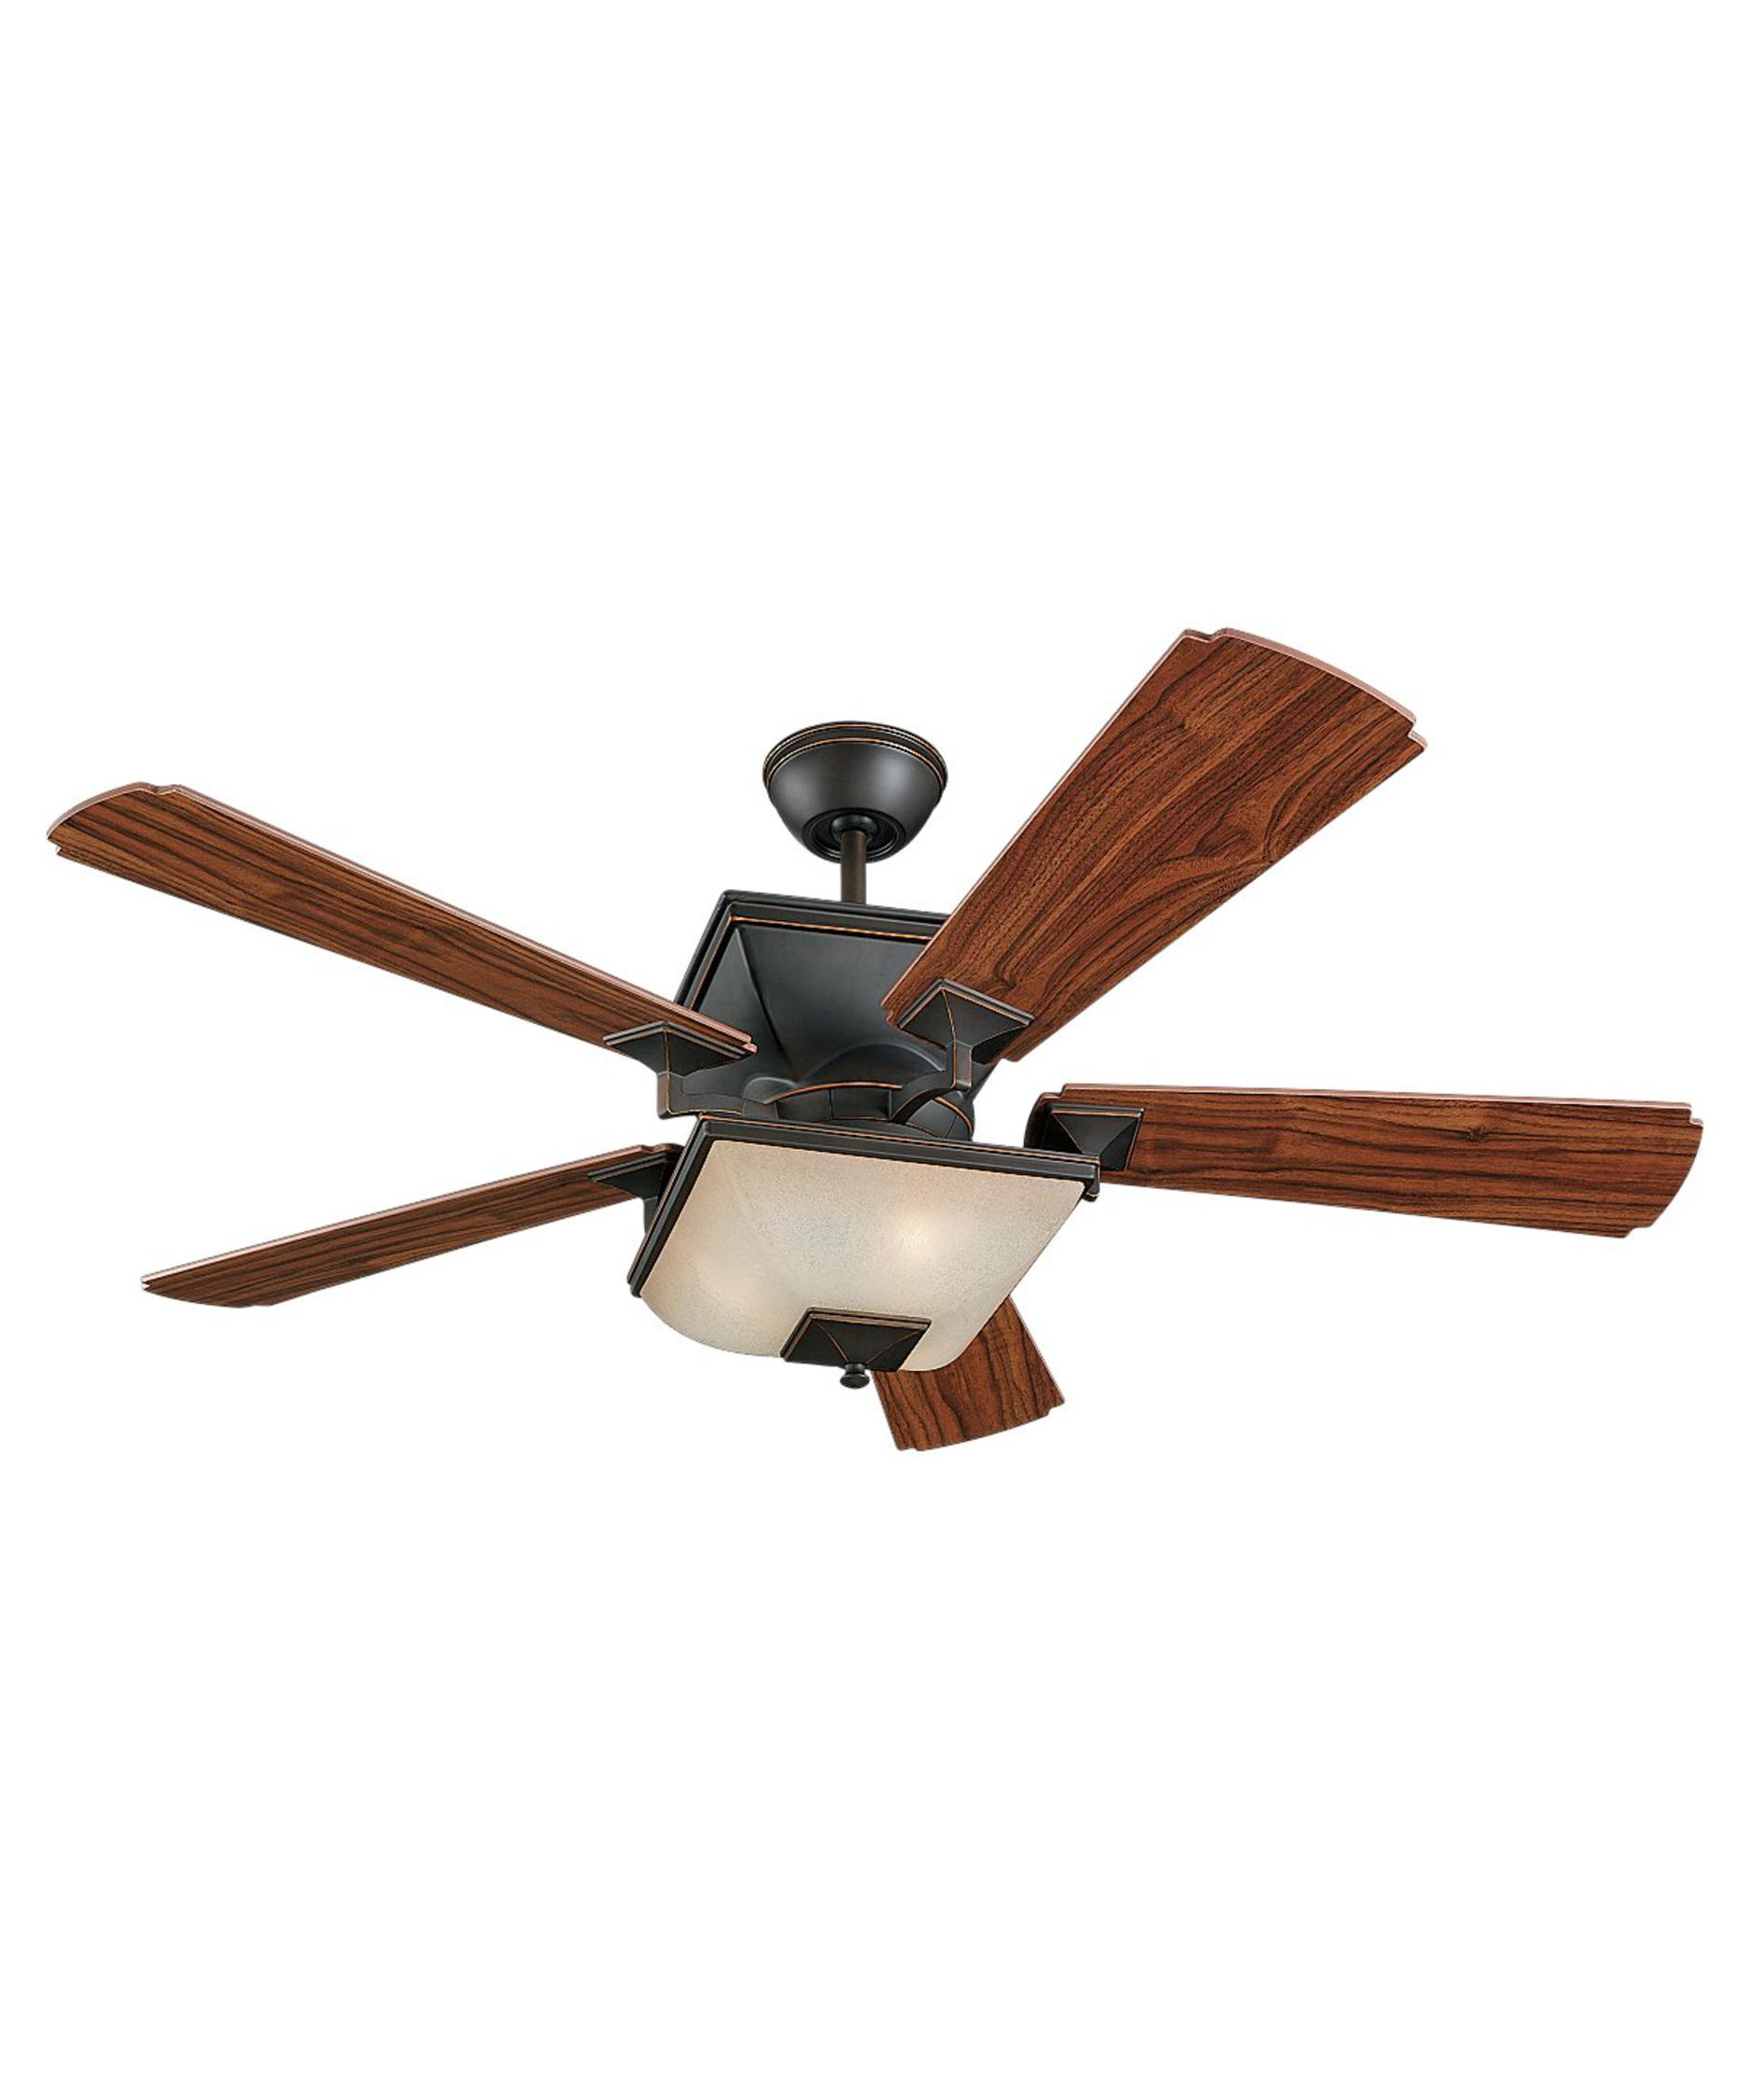 monte carlo 5tq52 town square 52 inch 5 blade ceiling fan